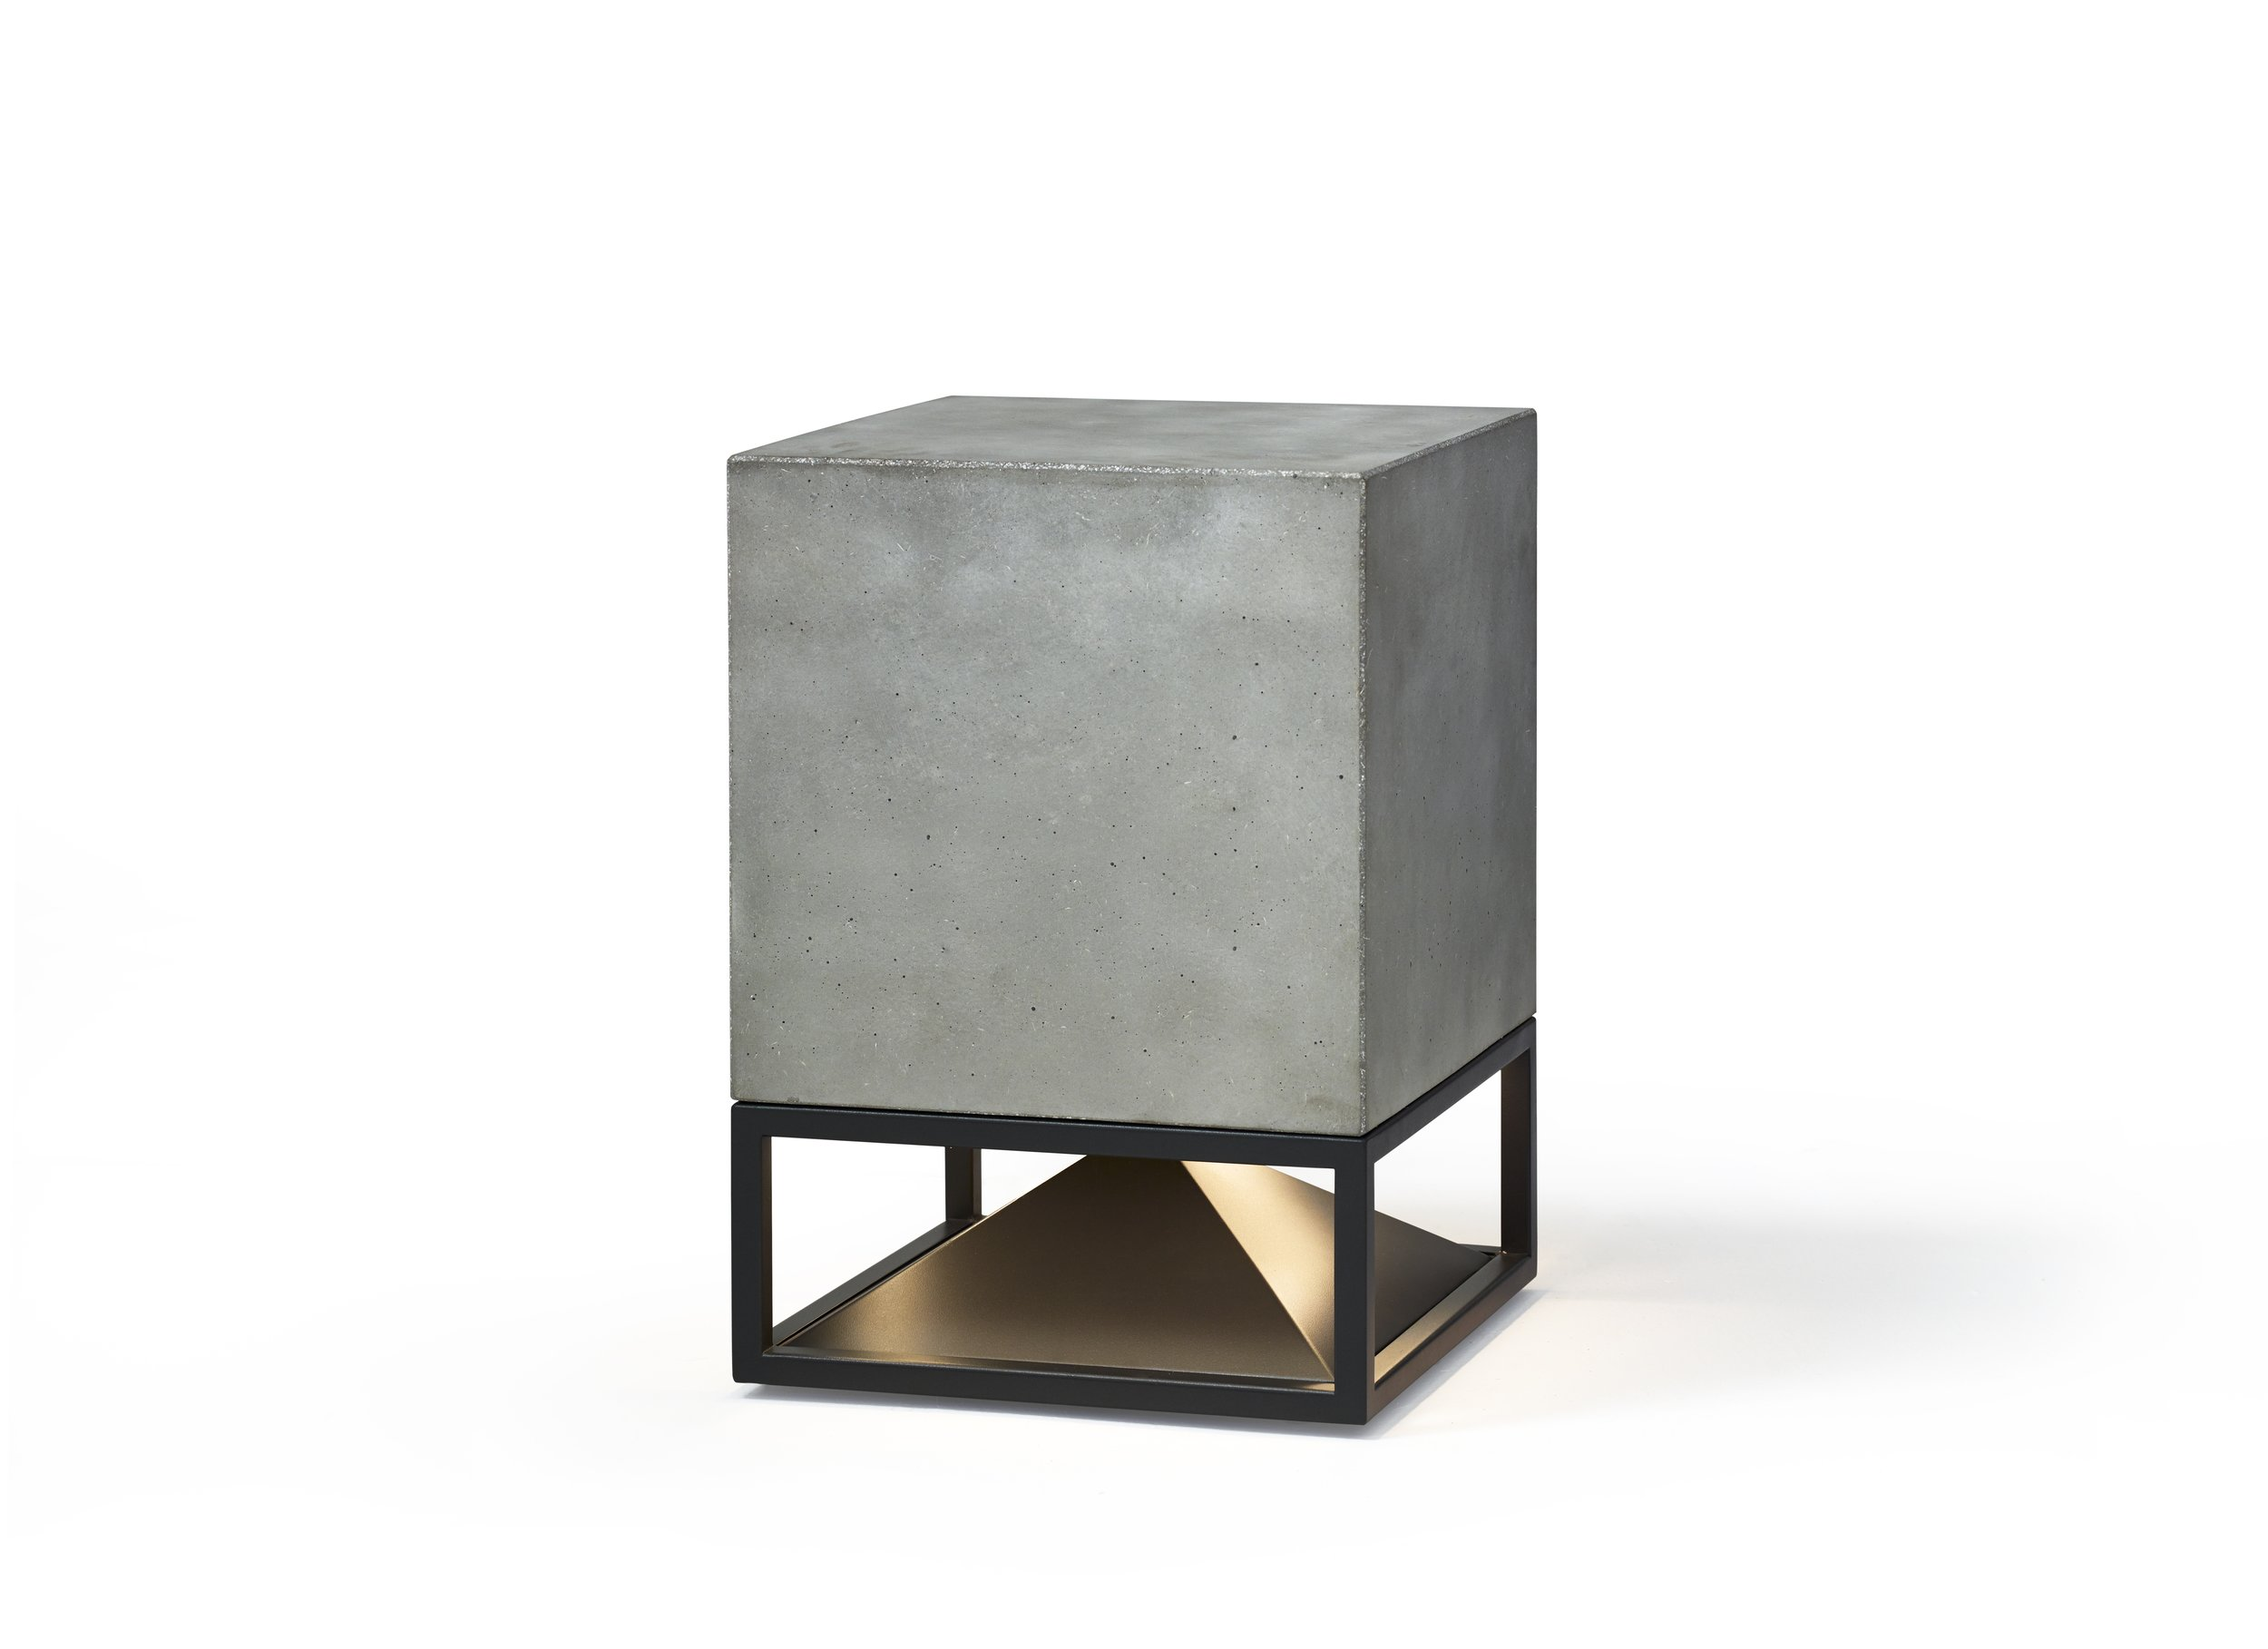 Cube_ConcreteLight34416-1.jpg